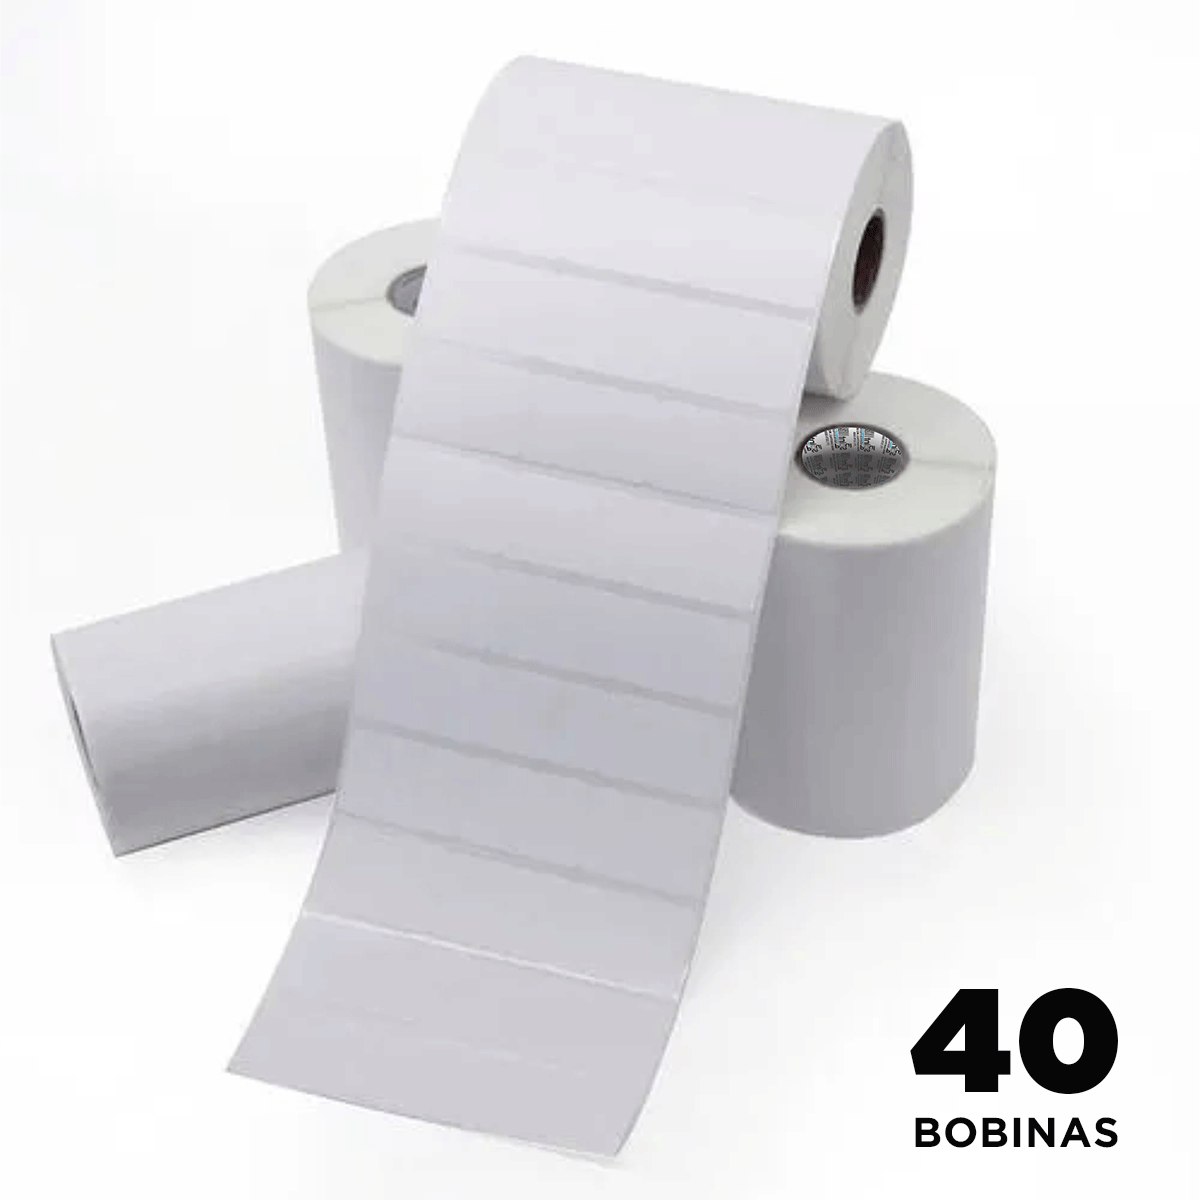 40 Rolos de Etiquetas Premium 34x23mm Couchê Branco Brilho